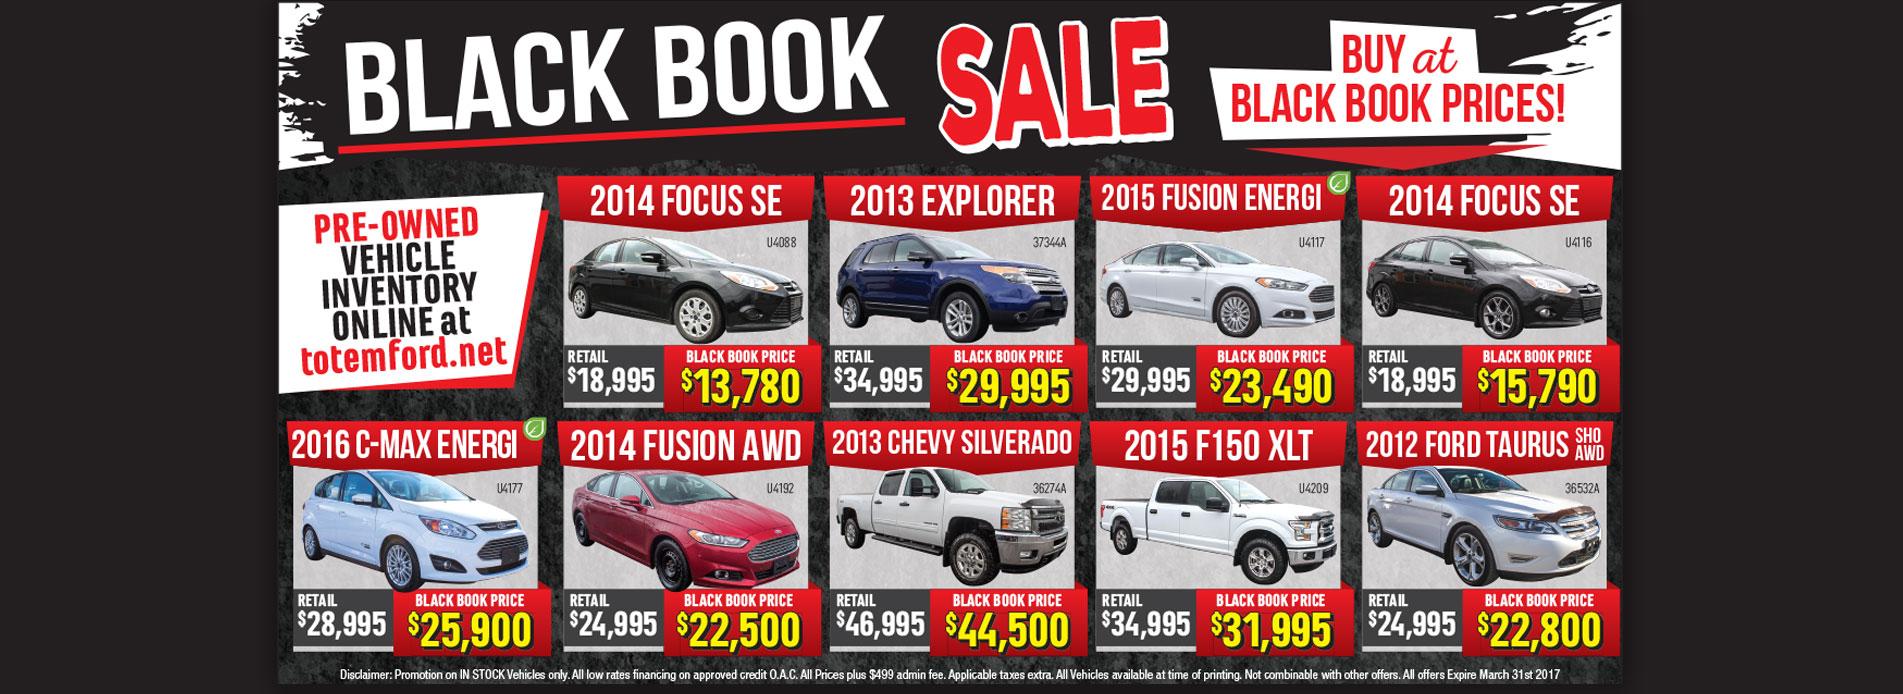 Black Book Sale Flyer